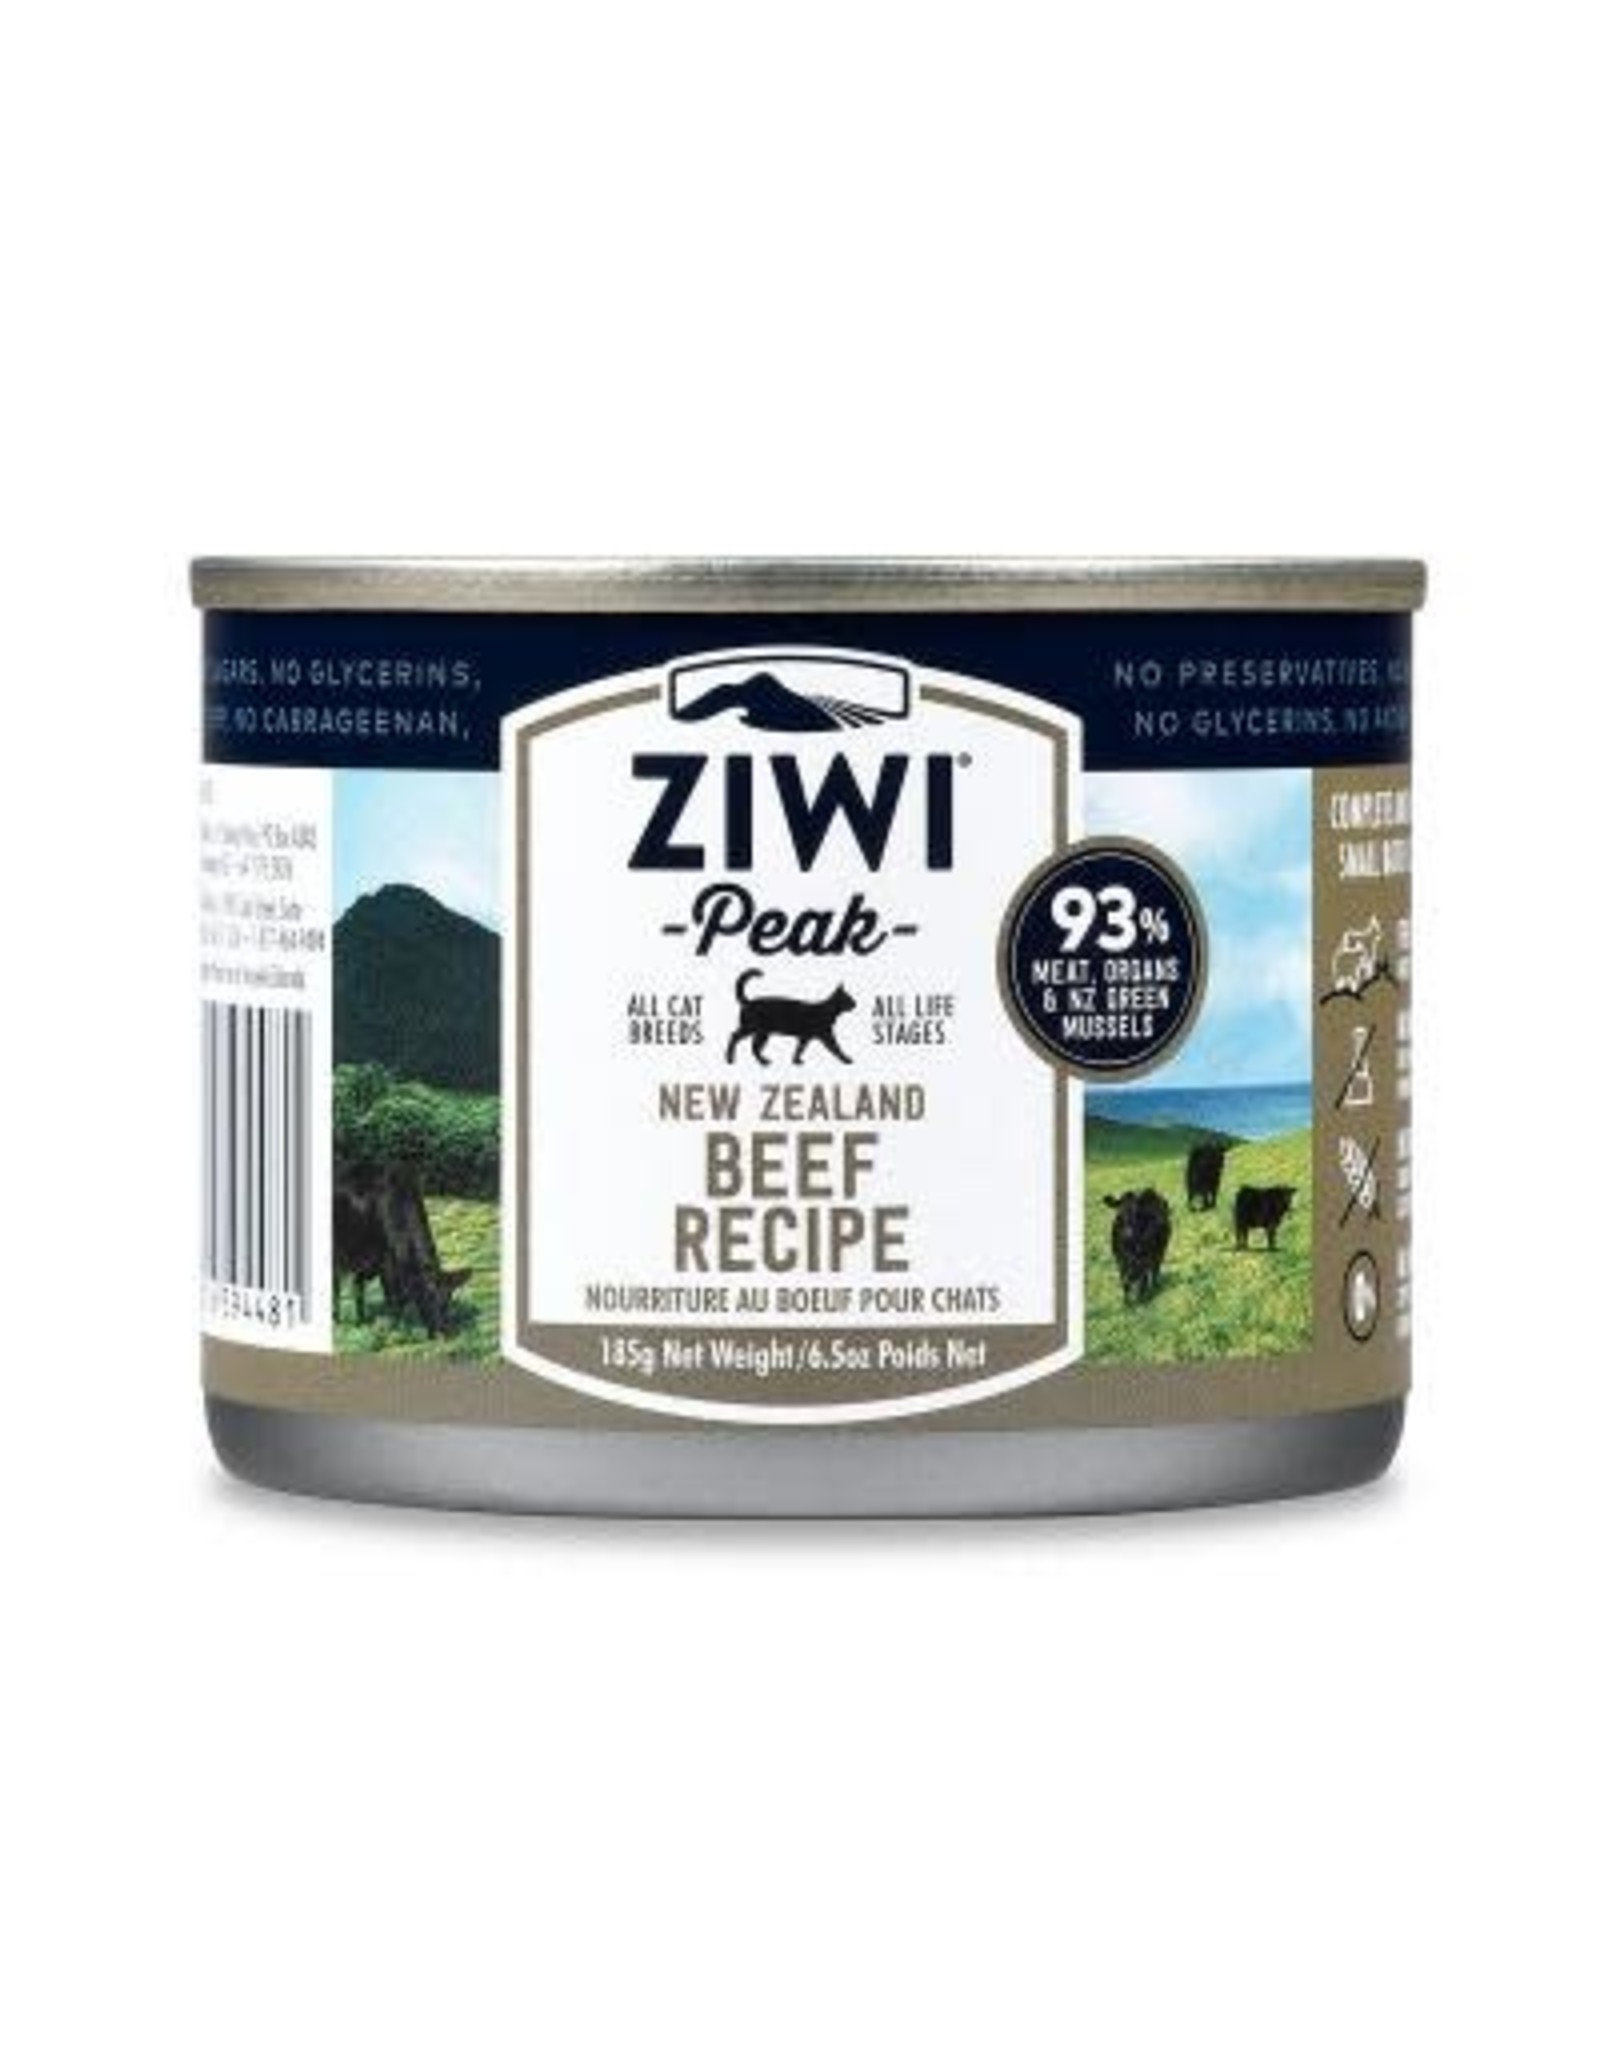 Ziwi Peak Ziwi Peak Beef Recipe for Cats 6.5oz